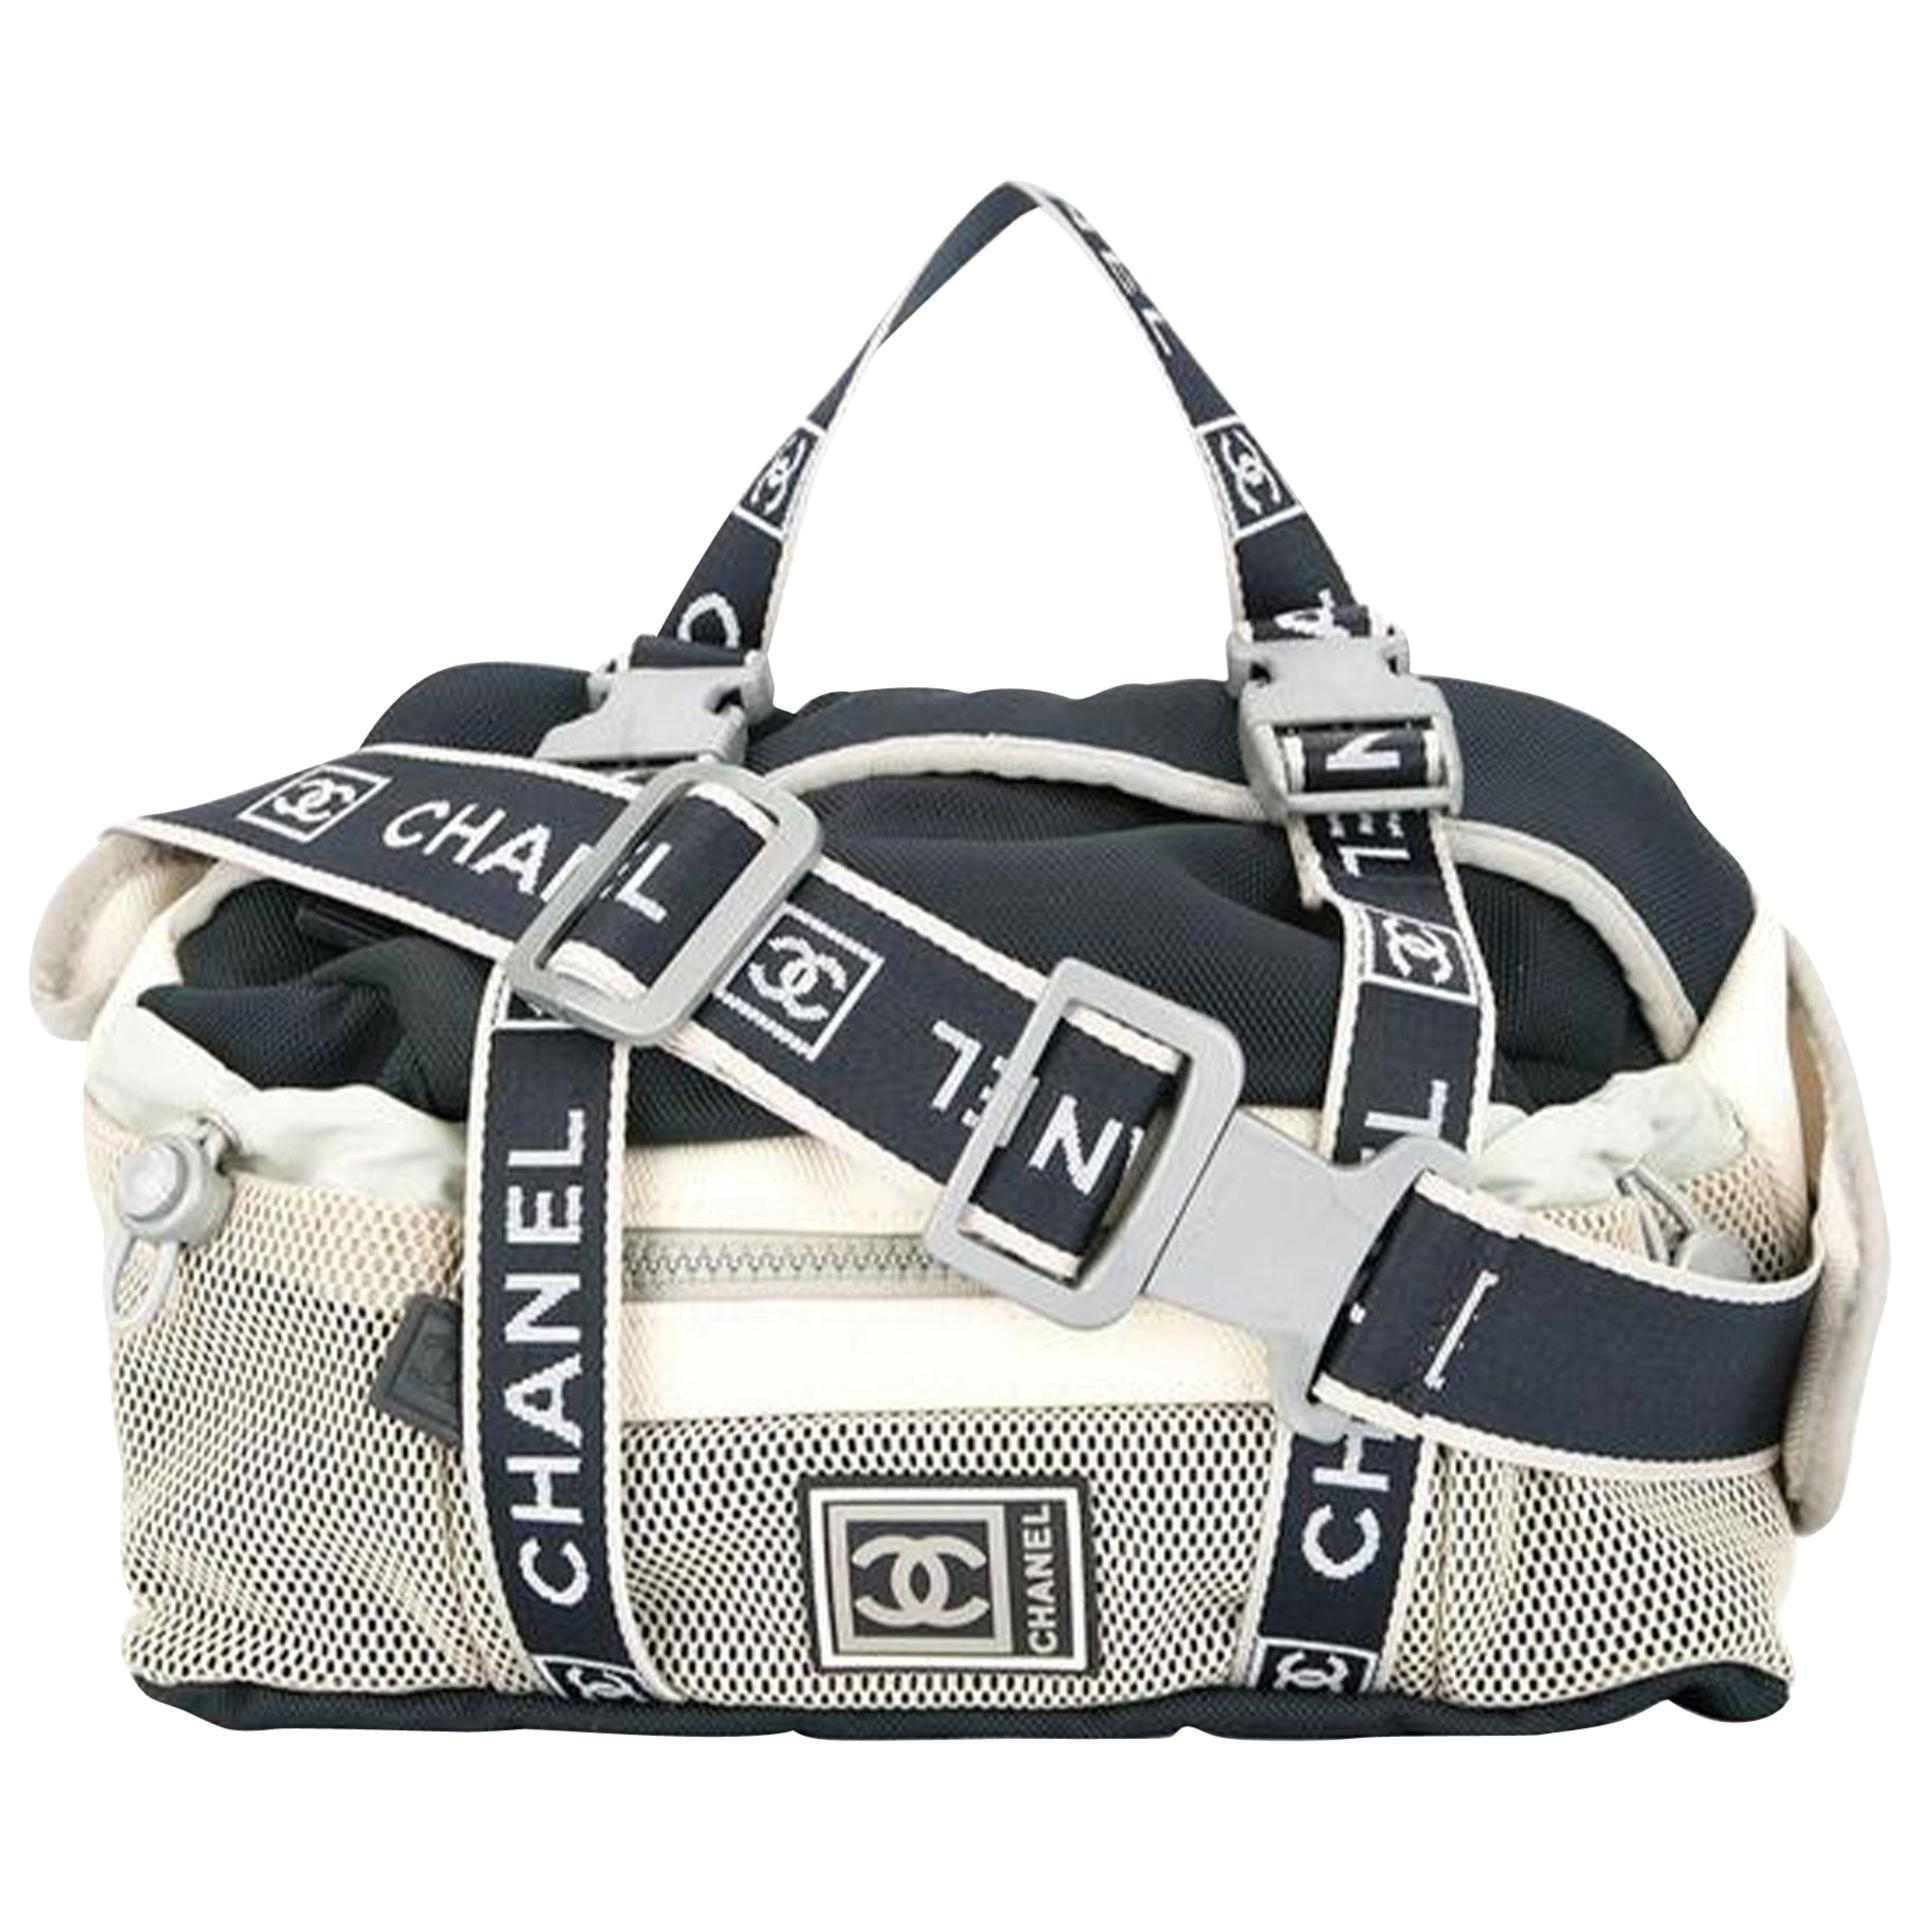 Chanel Waist 2000s Vintage Sport Unisex Navy Blue Cross Body Fanny Pack